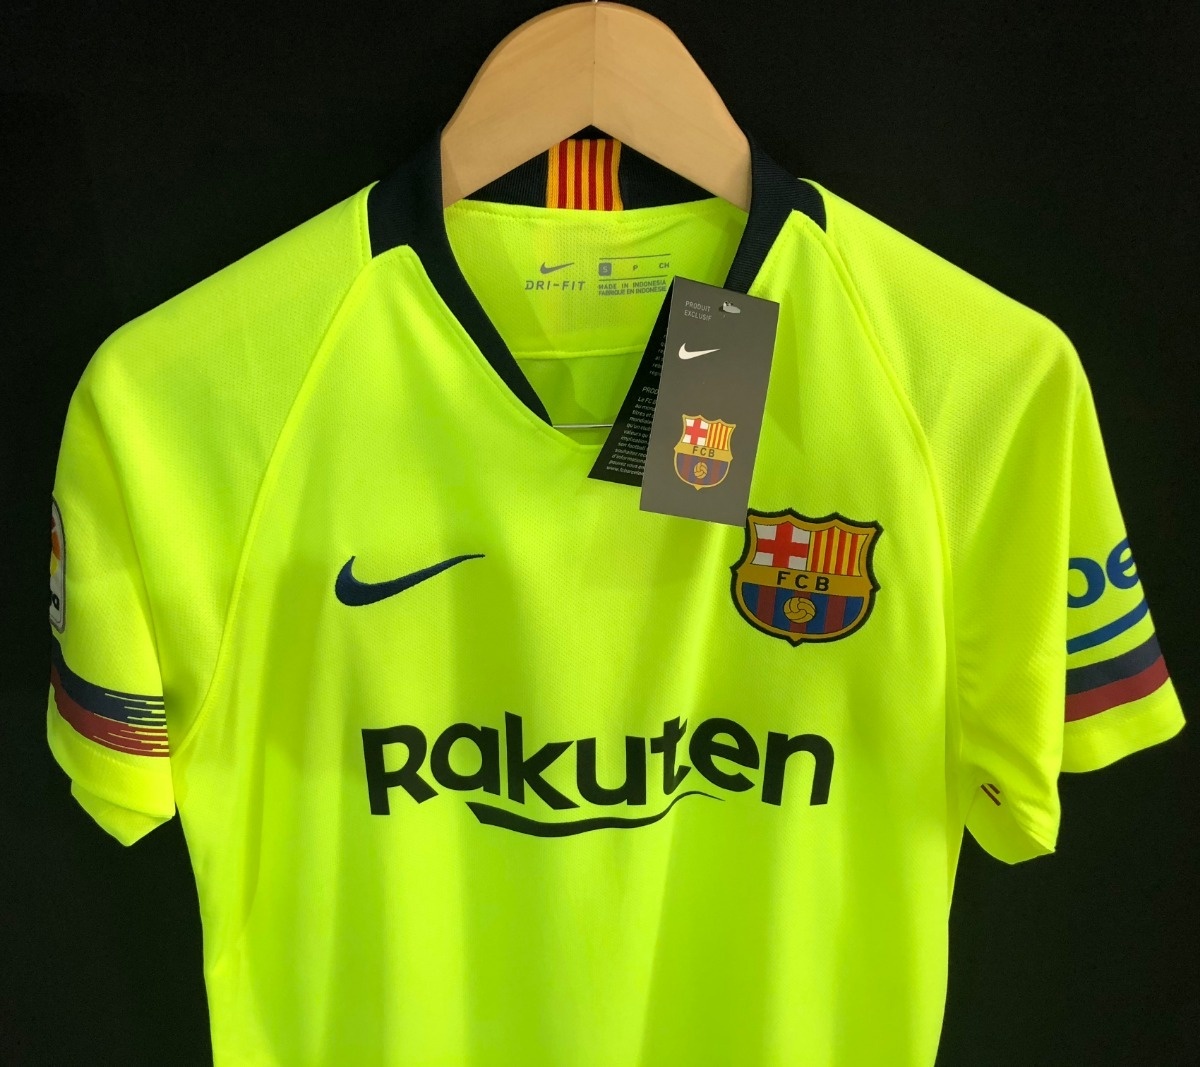 camisa nike barcelona oficial 2019 away pronta entrega. Carregando zoom. 2e1e153e8f0dd